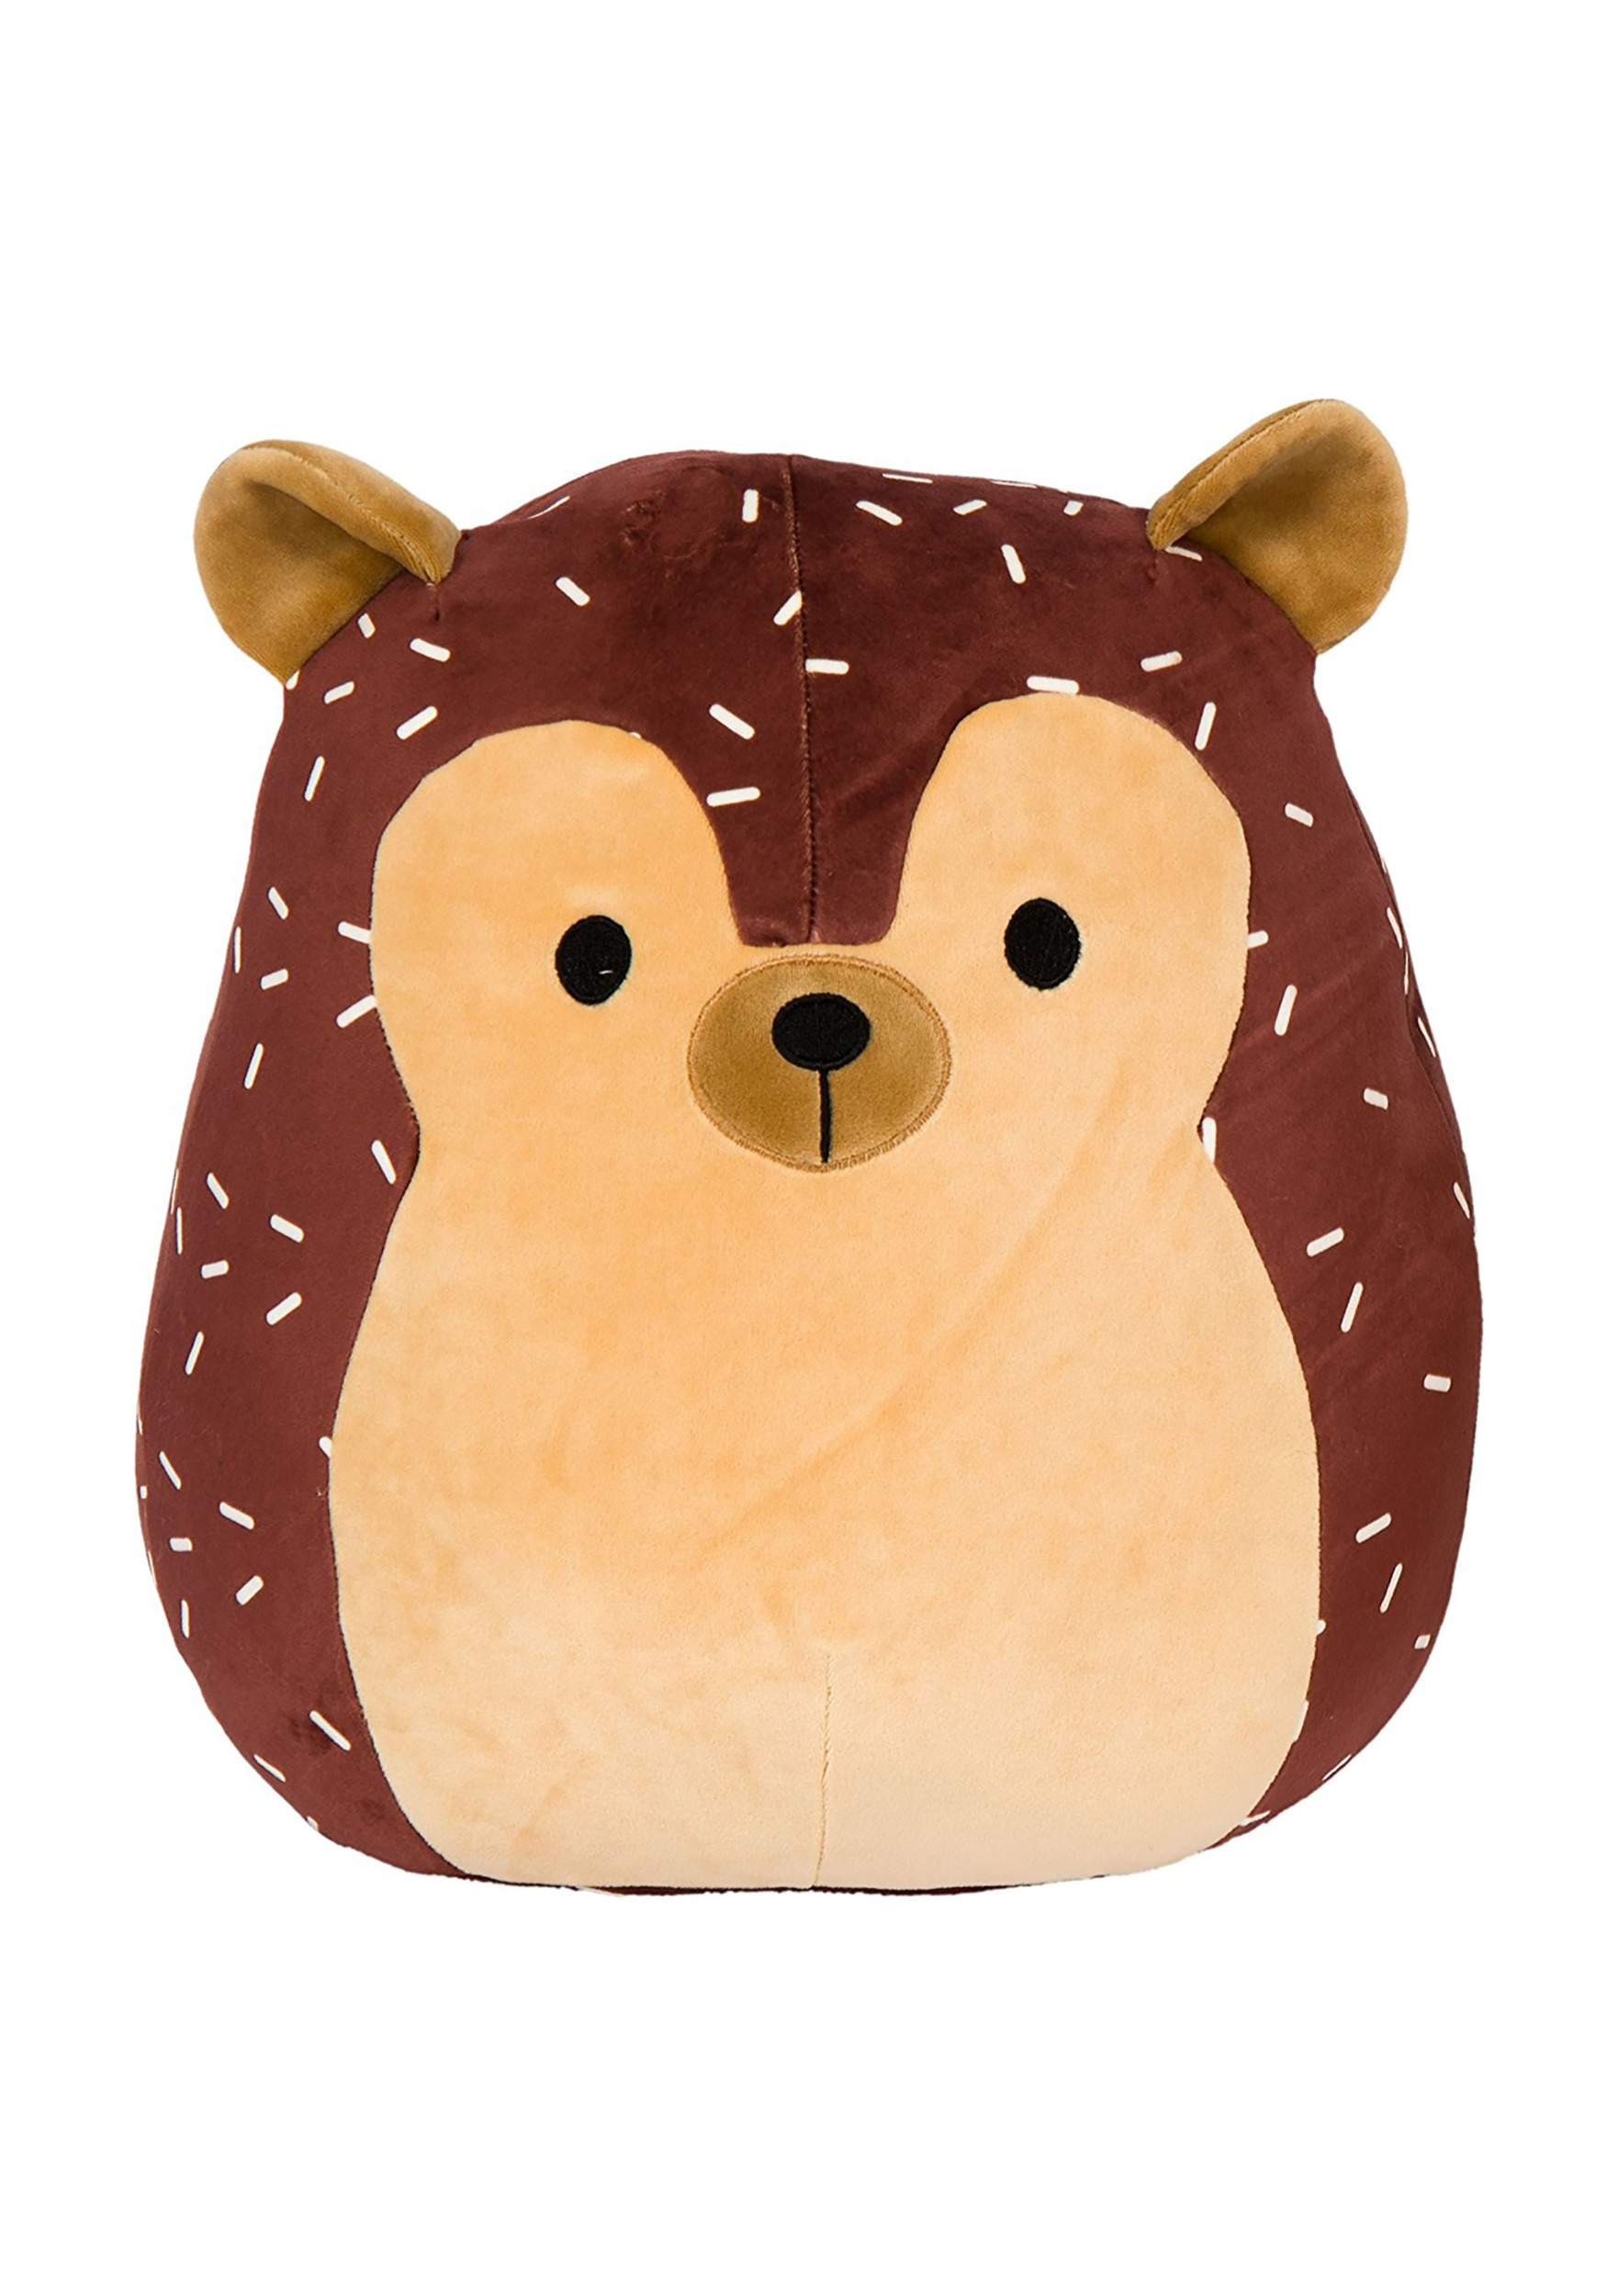 Squishmallow Hedgehog 16 Plush